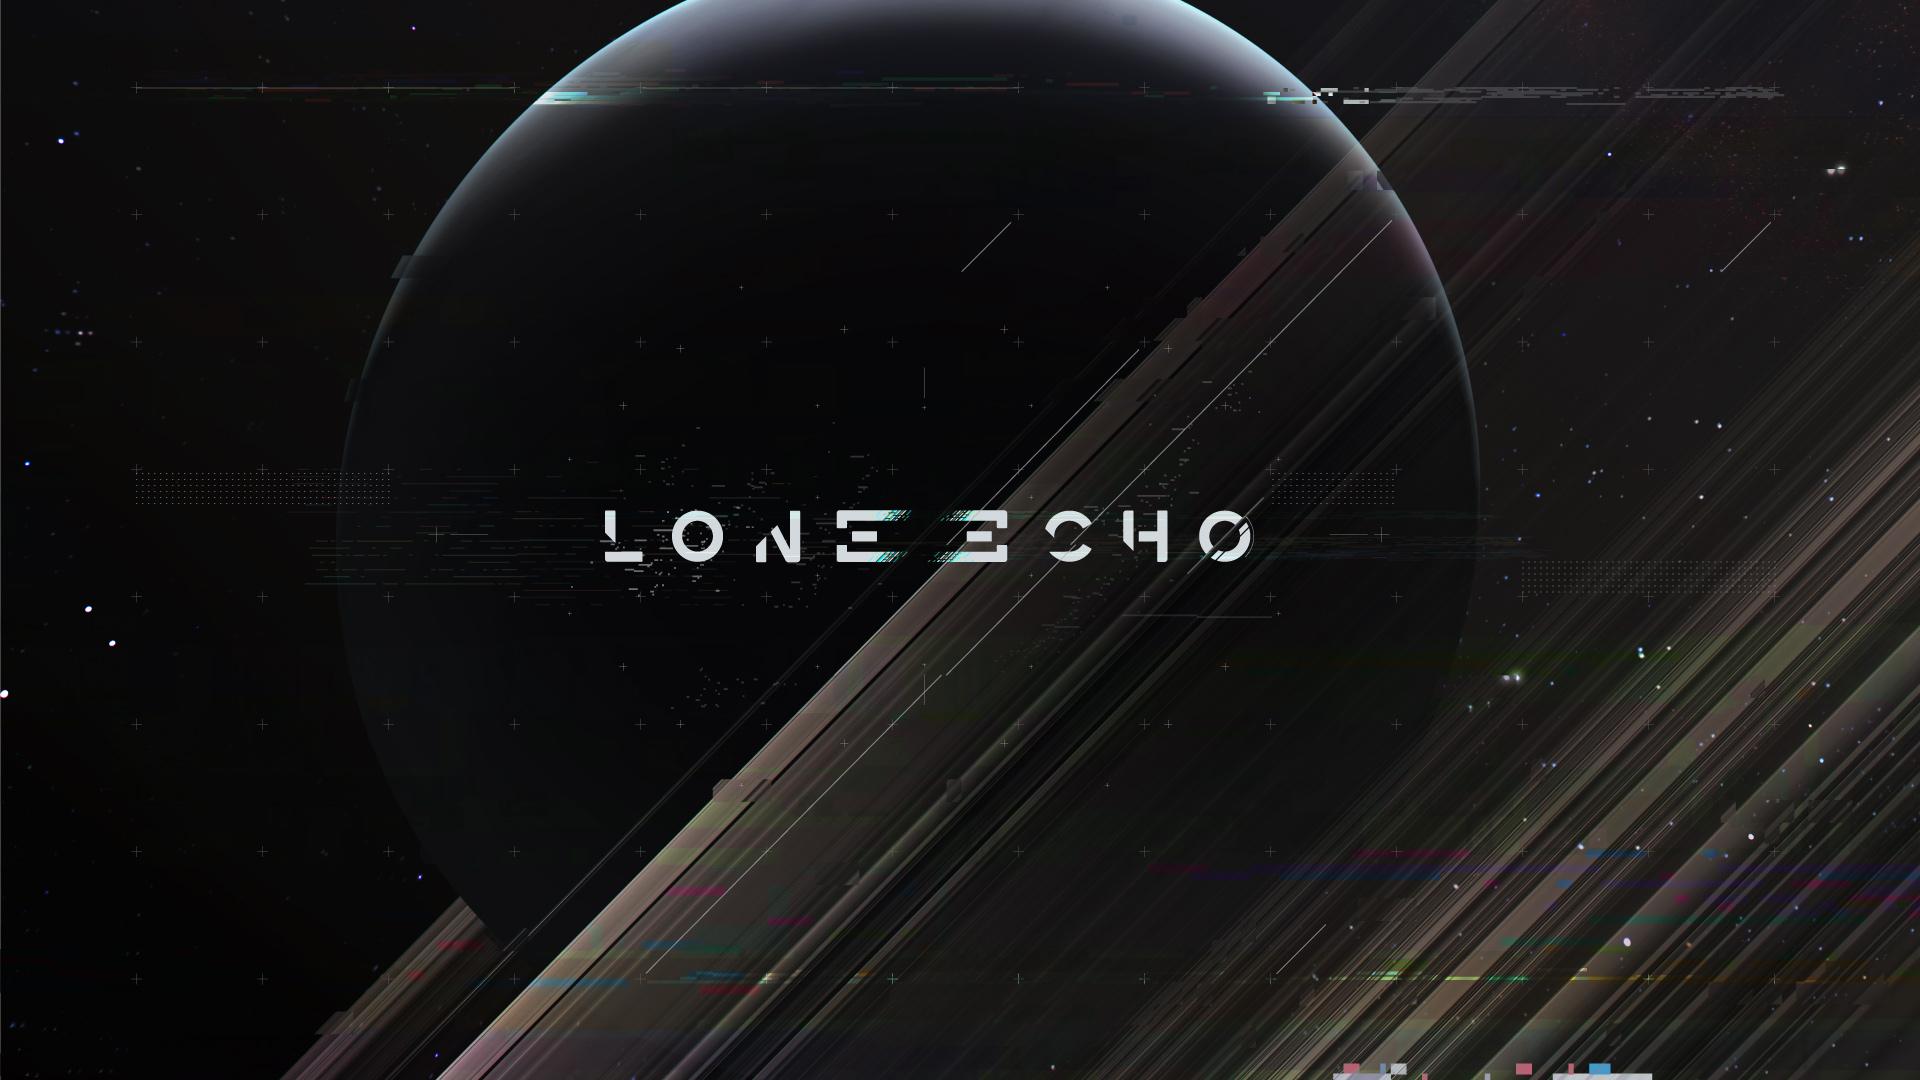 01_Logo_w_key_art__iteration_09